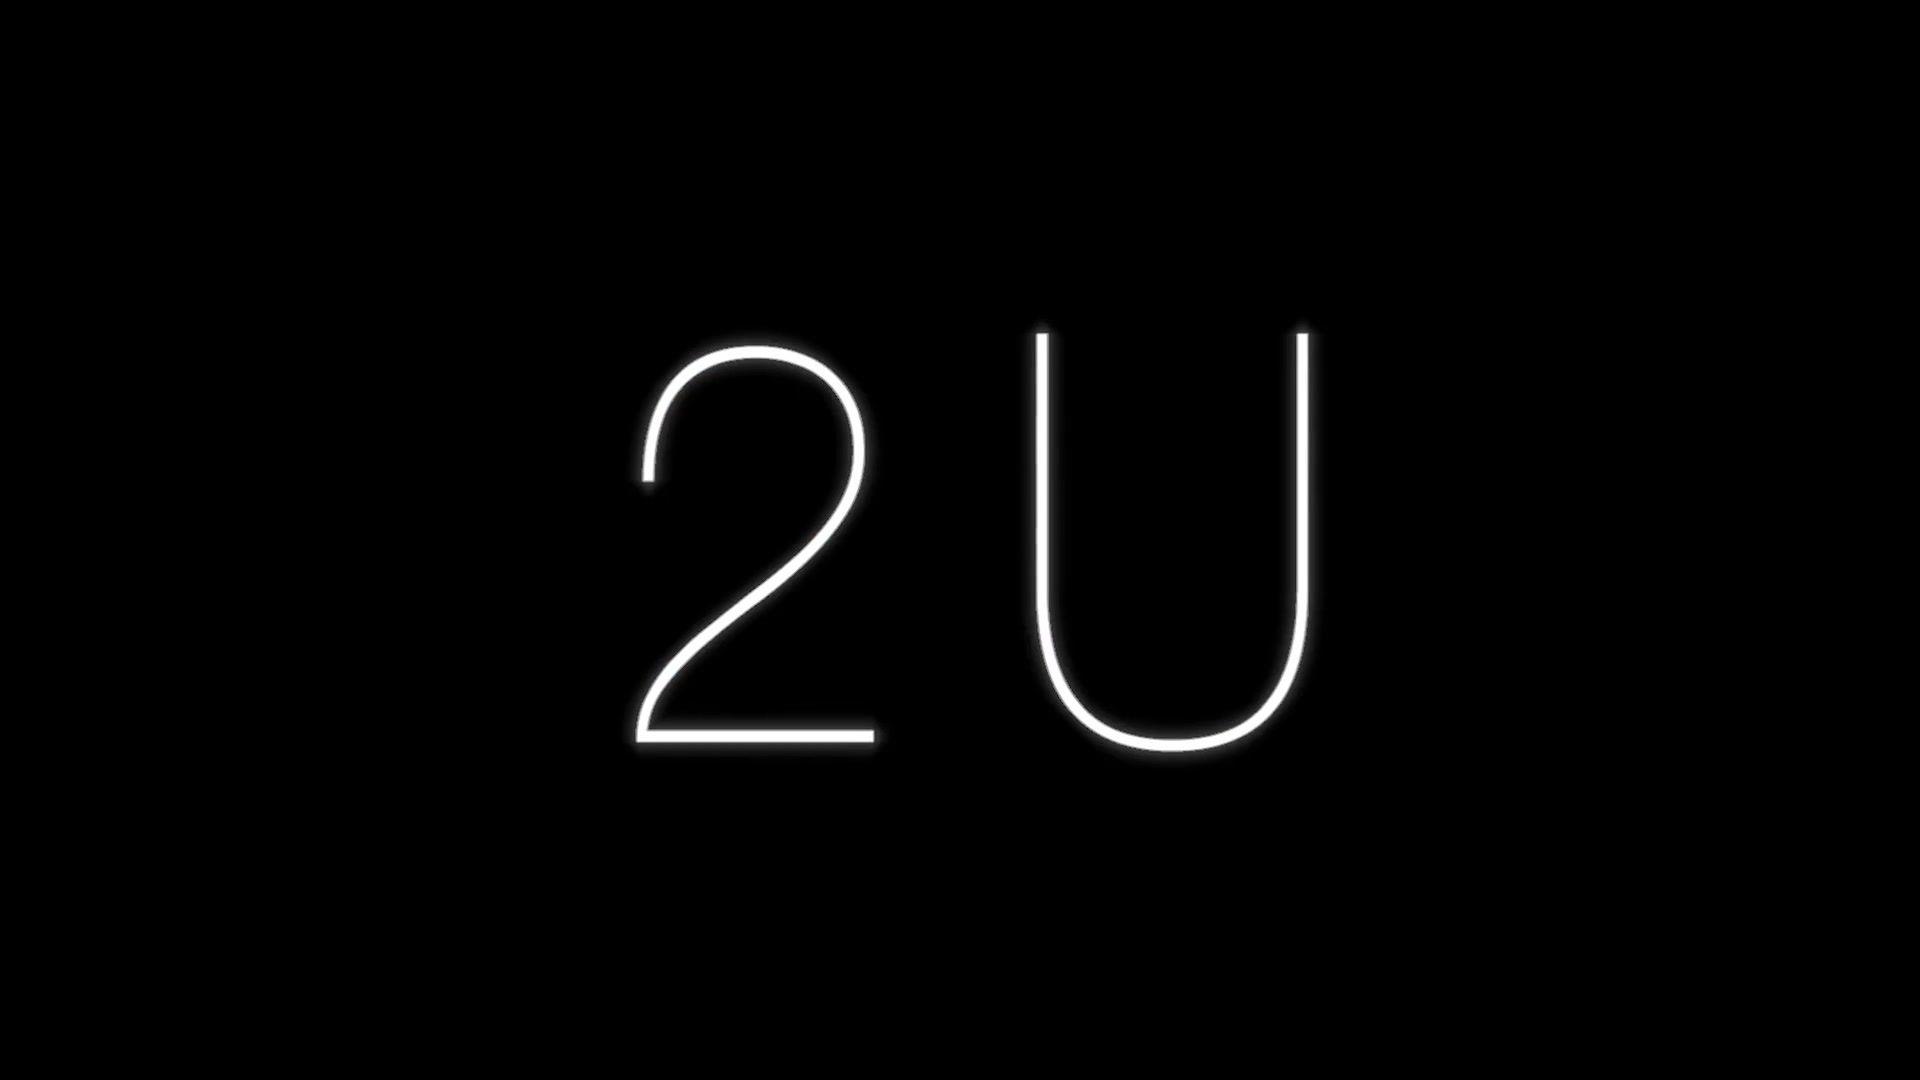 2U – David Guetta feat. Justin Bieber | Song quotes, David guetta, Justin  bieber